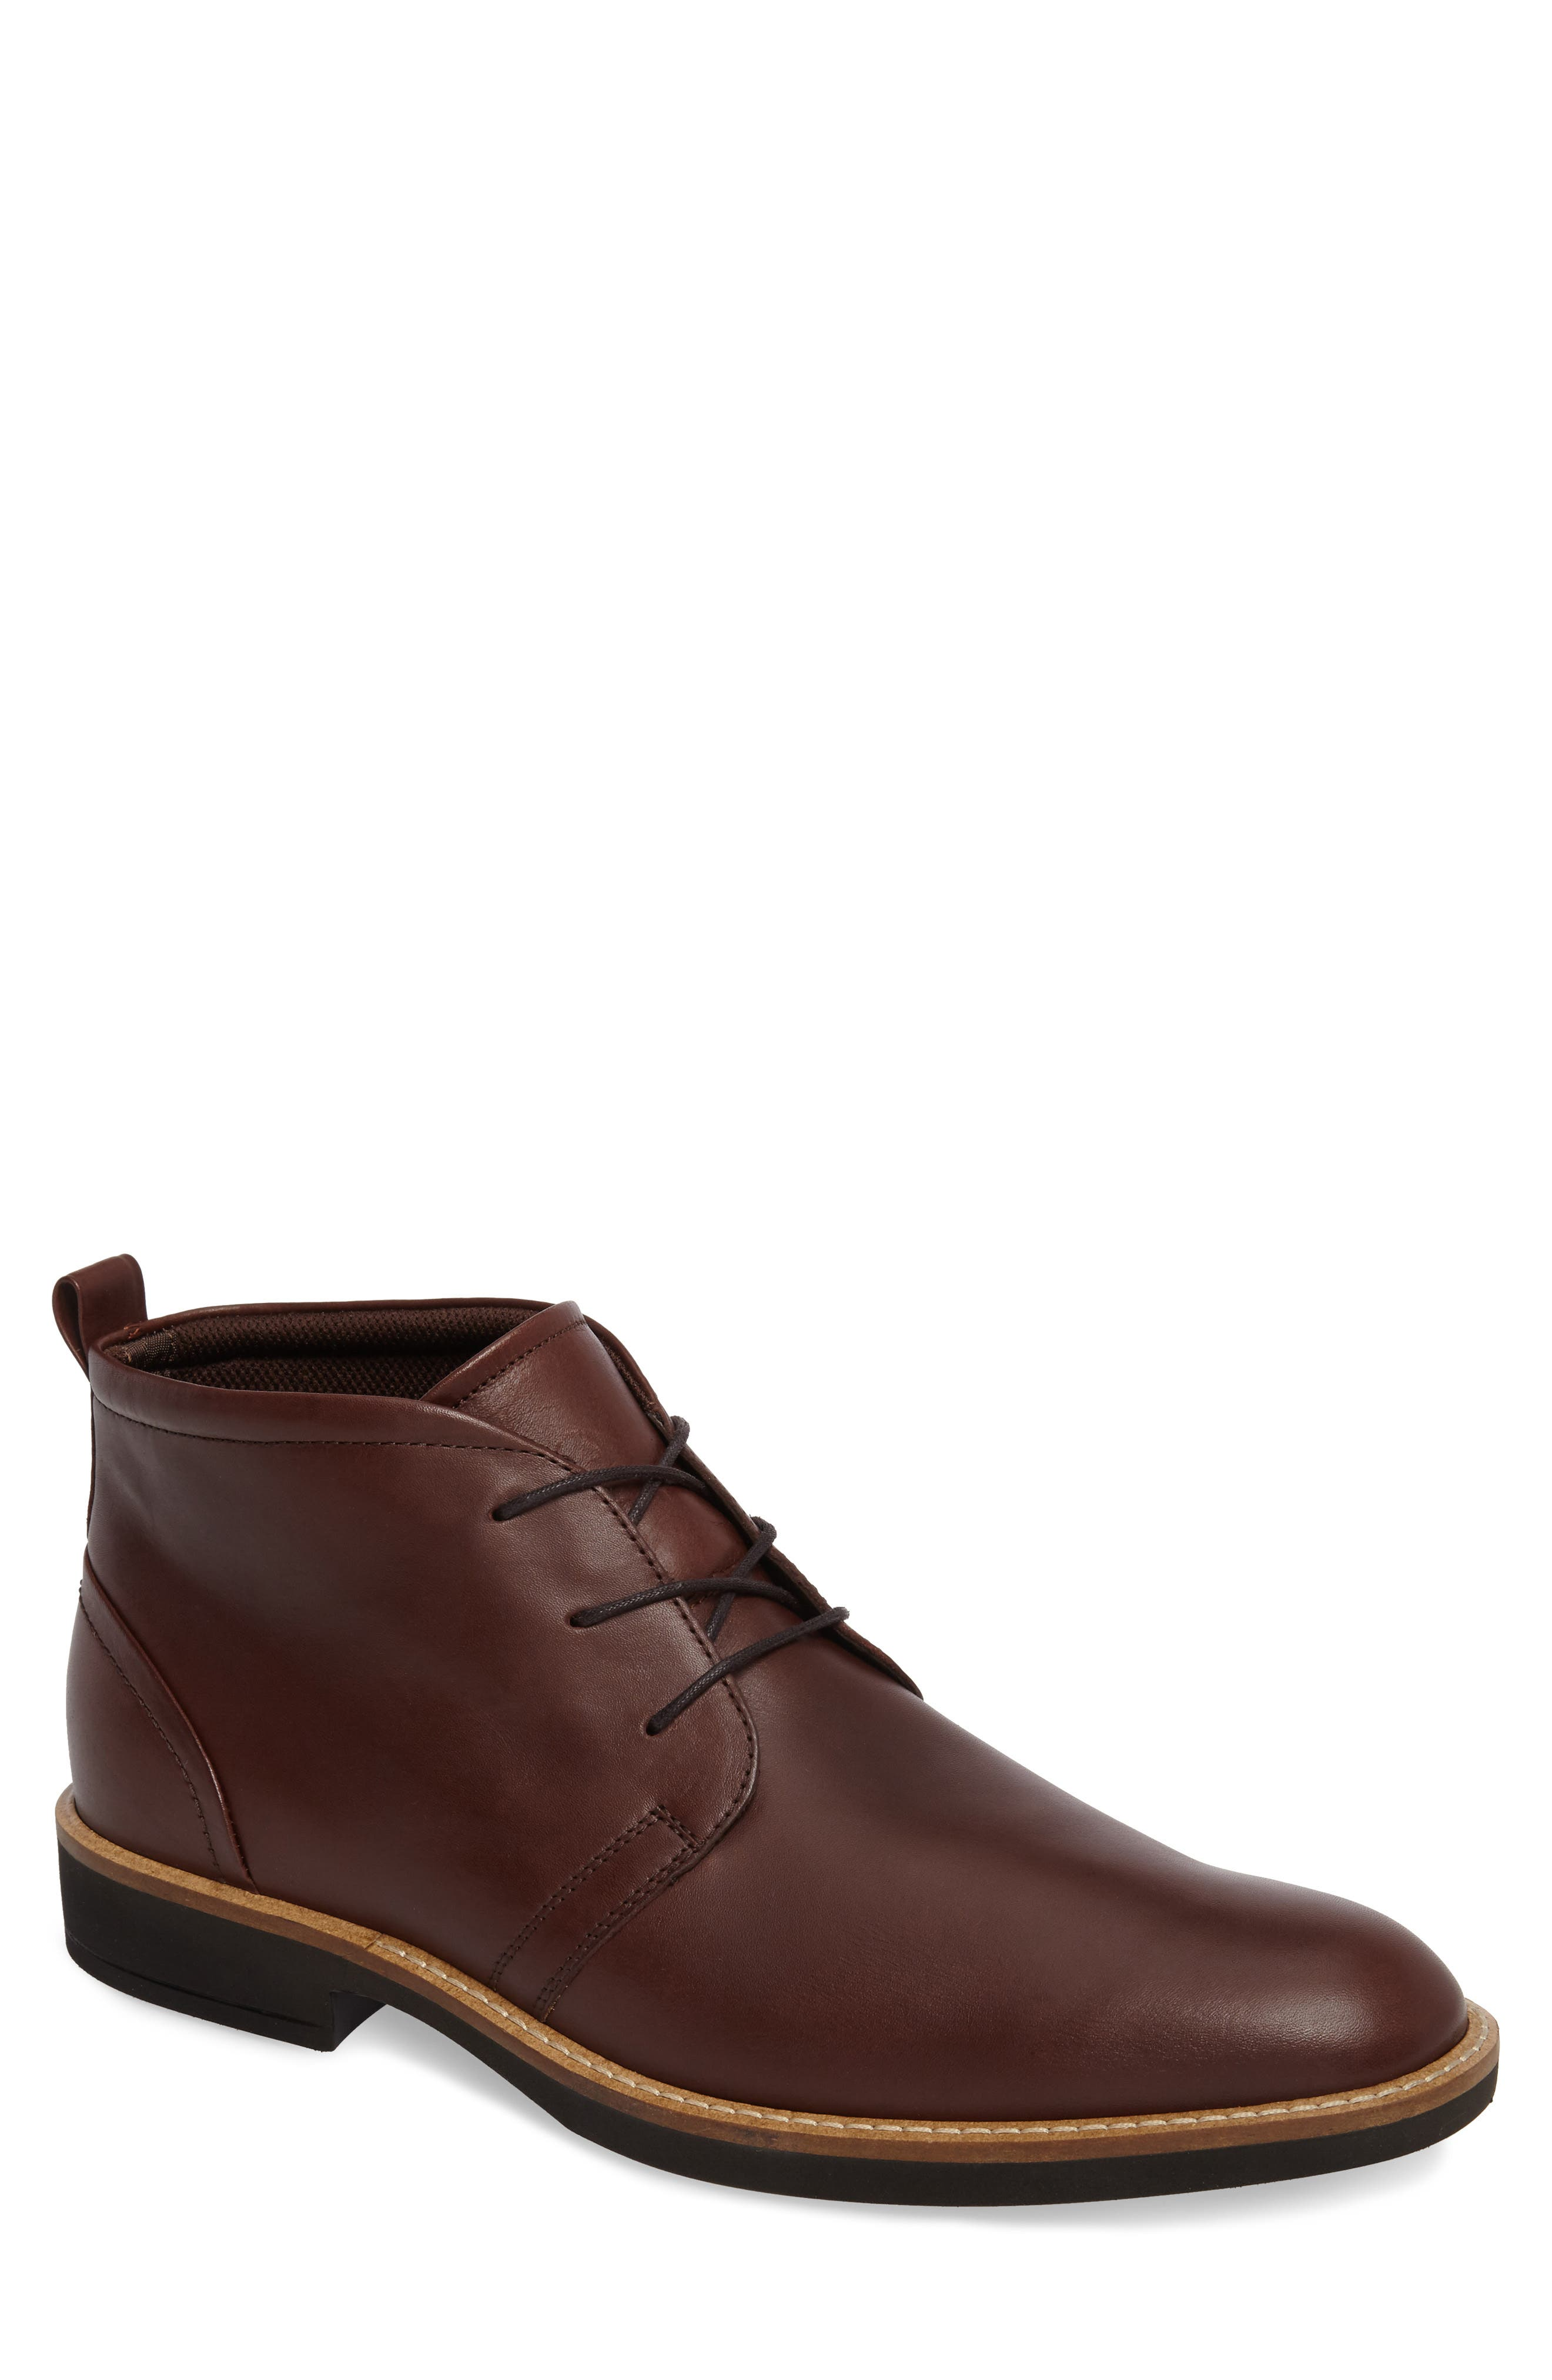 Biarritz Chukka Boot,                         Main,                         color, Rust Leather